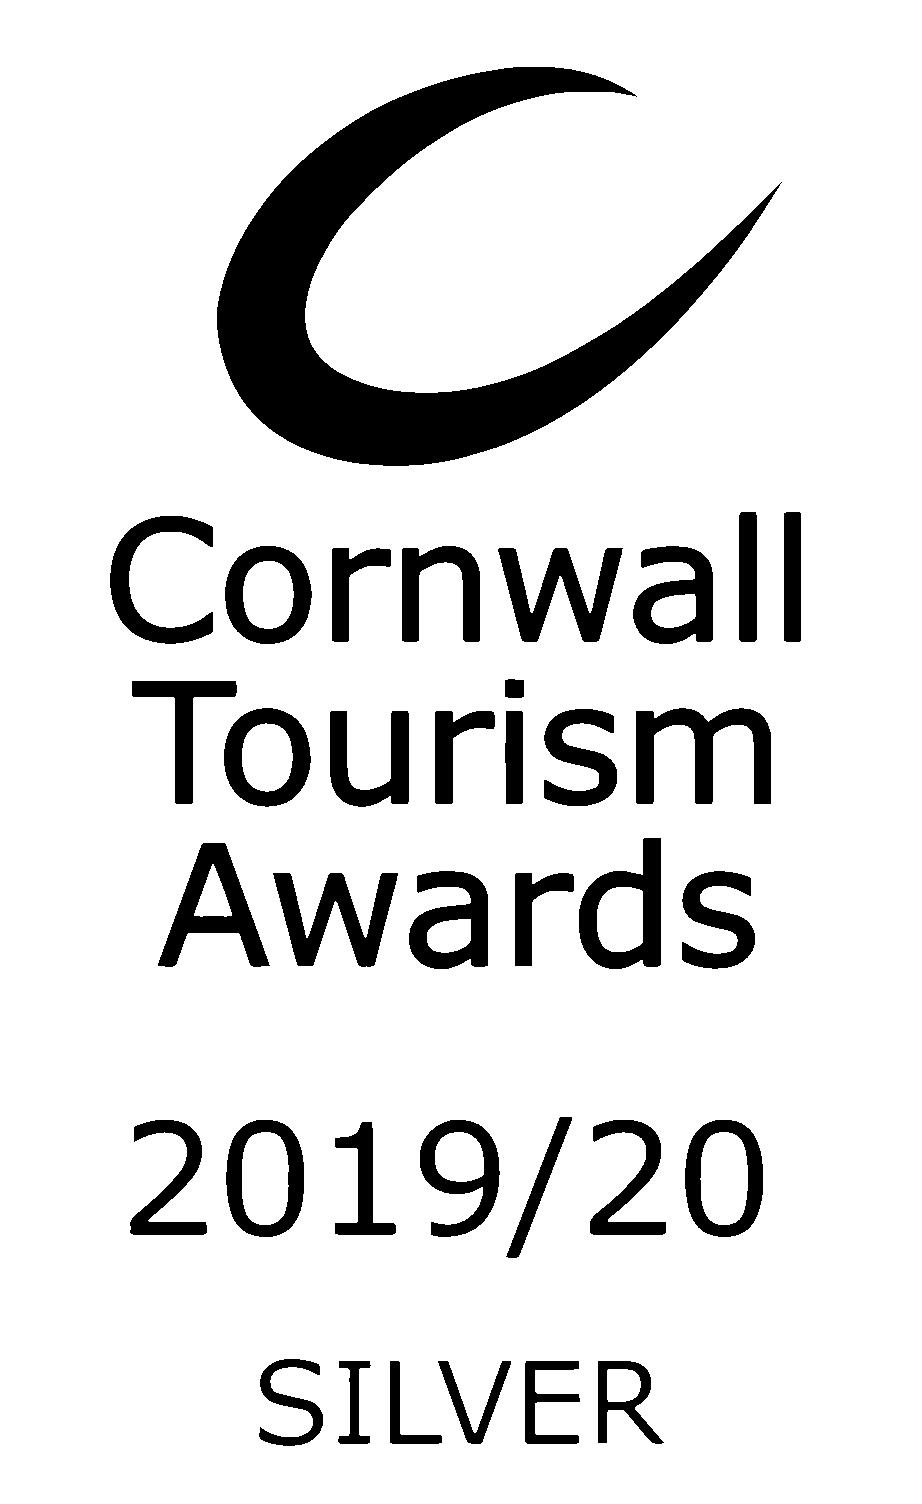 Cornwall Tourism award silver 2019 logo